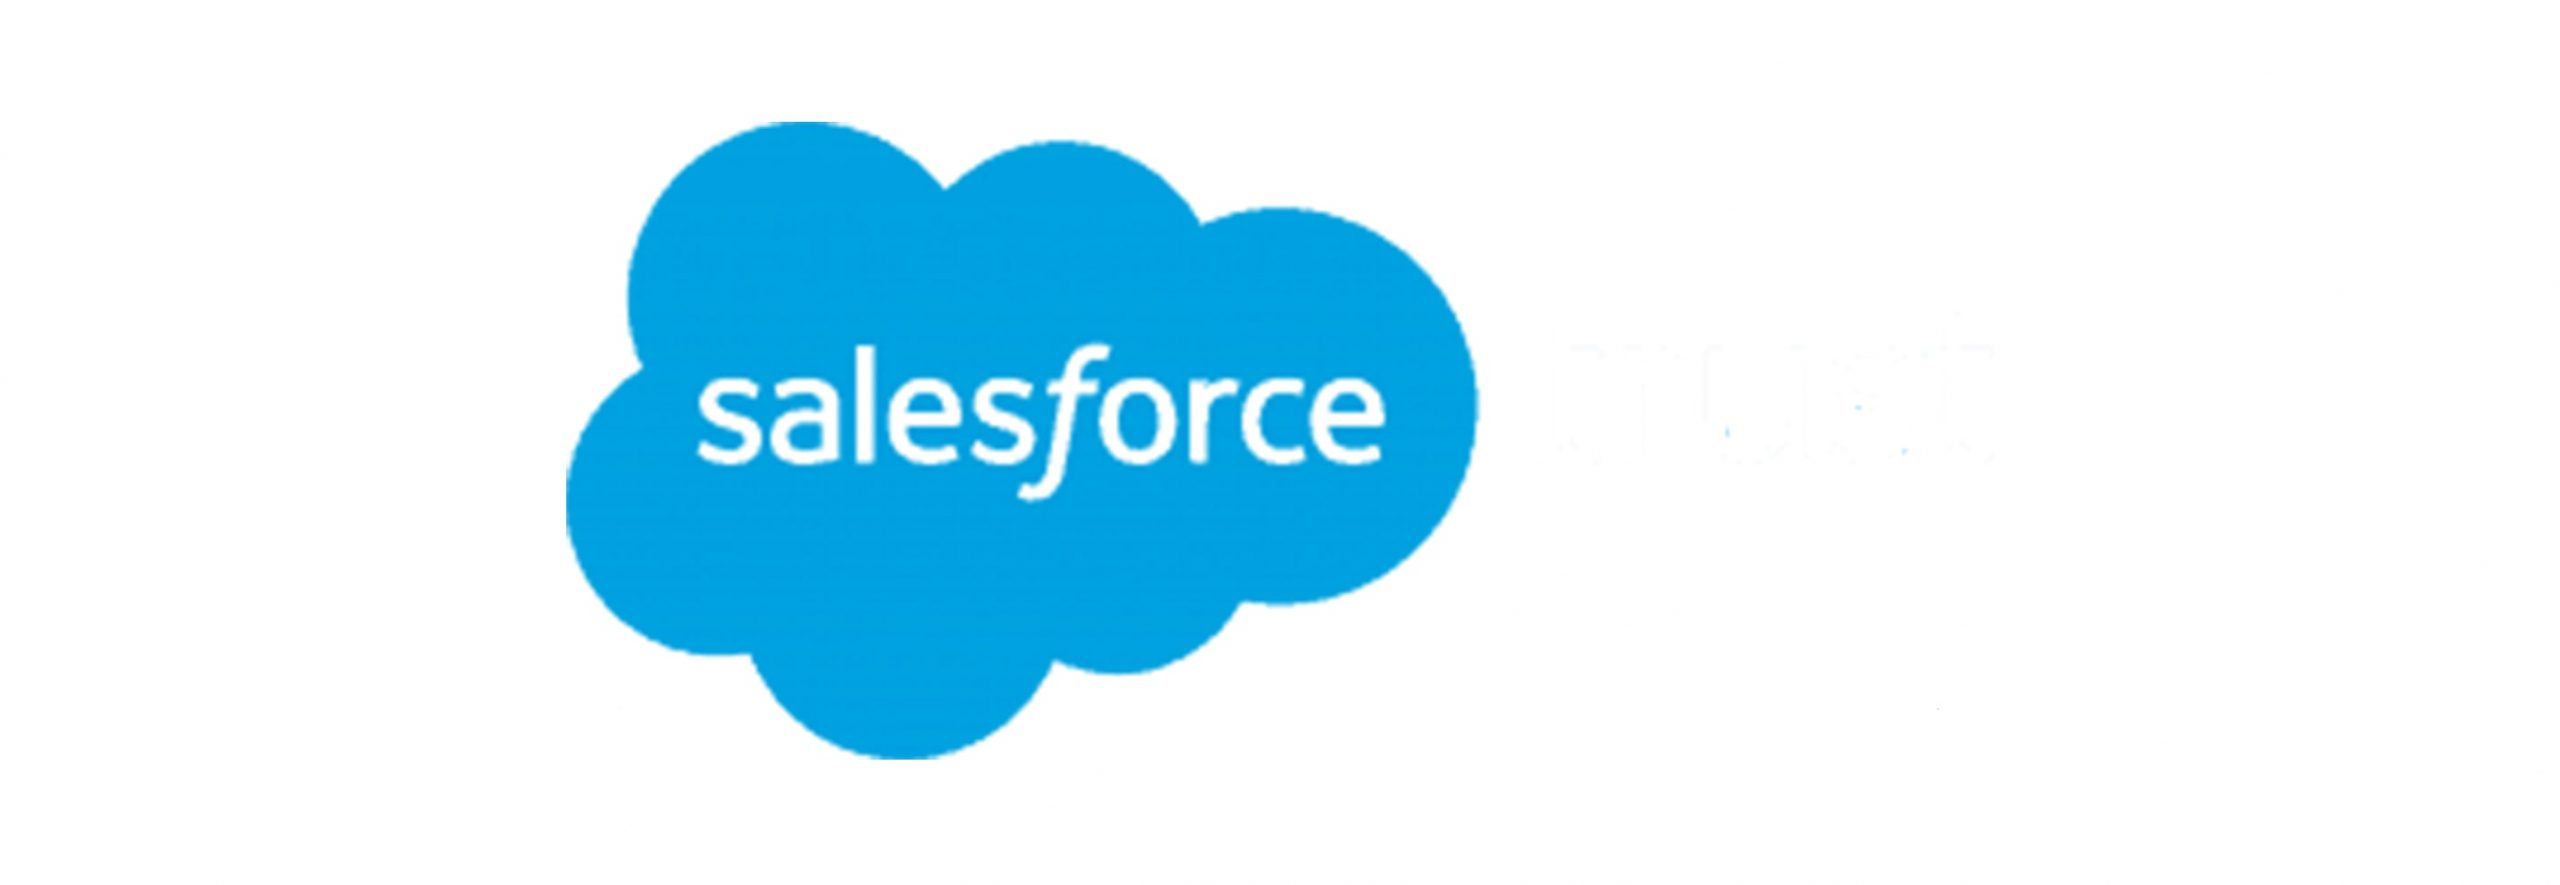 salesforce-min